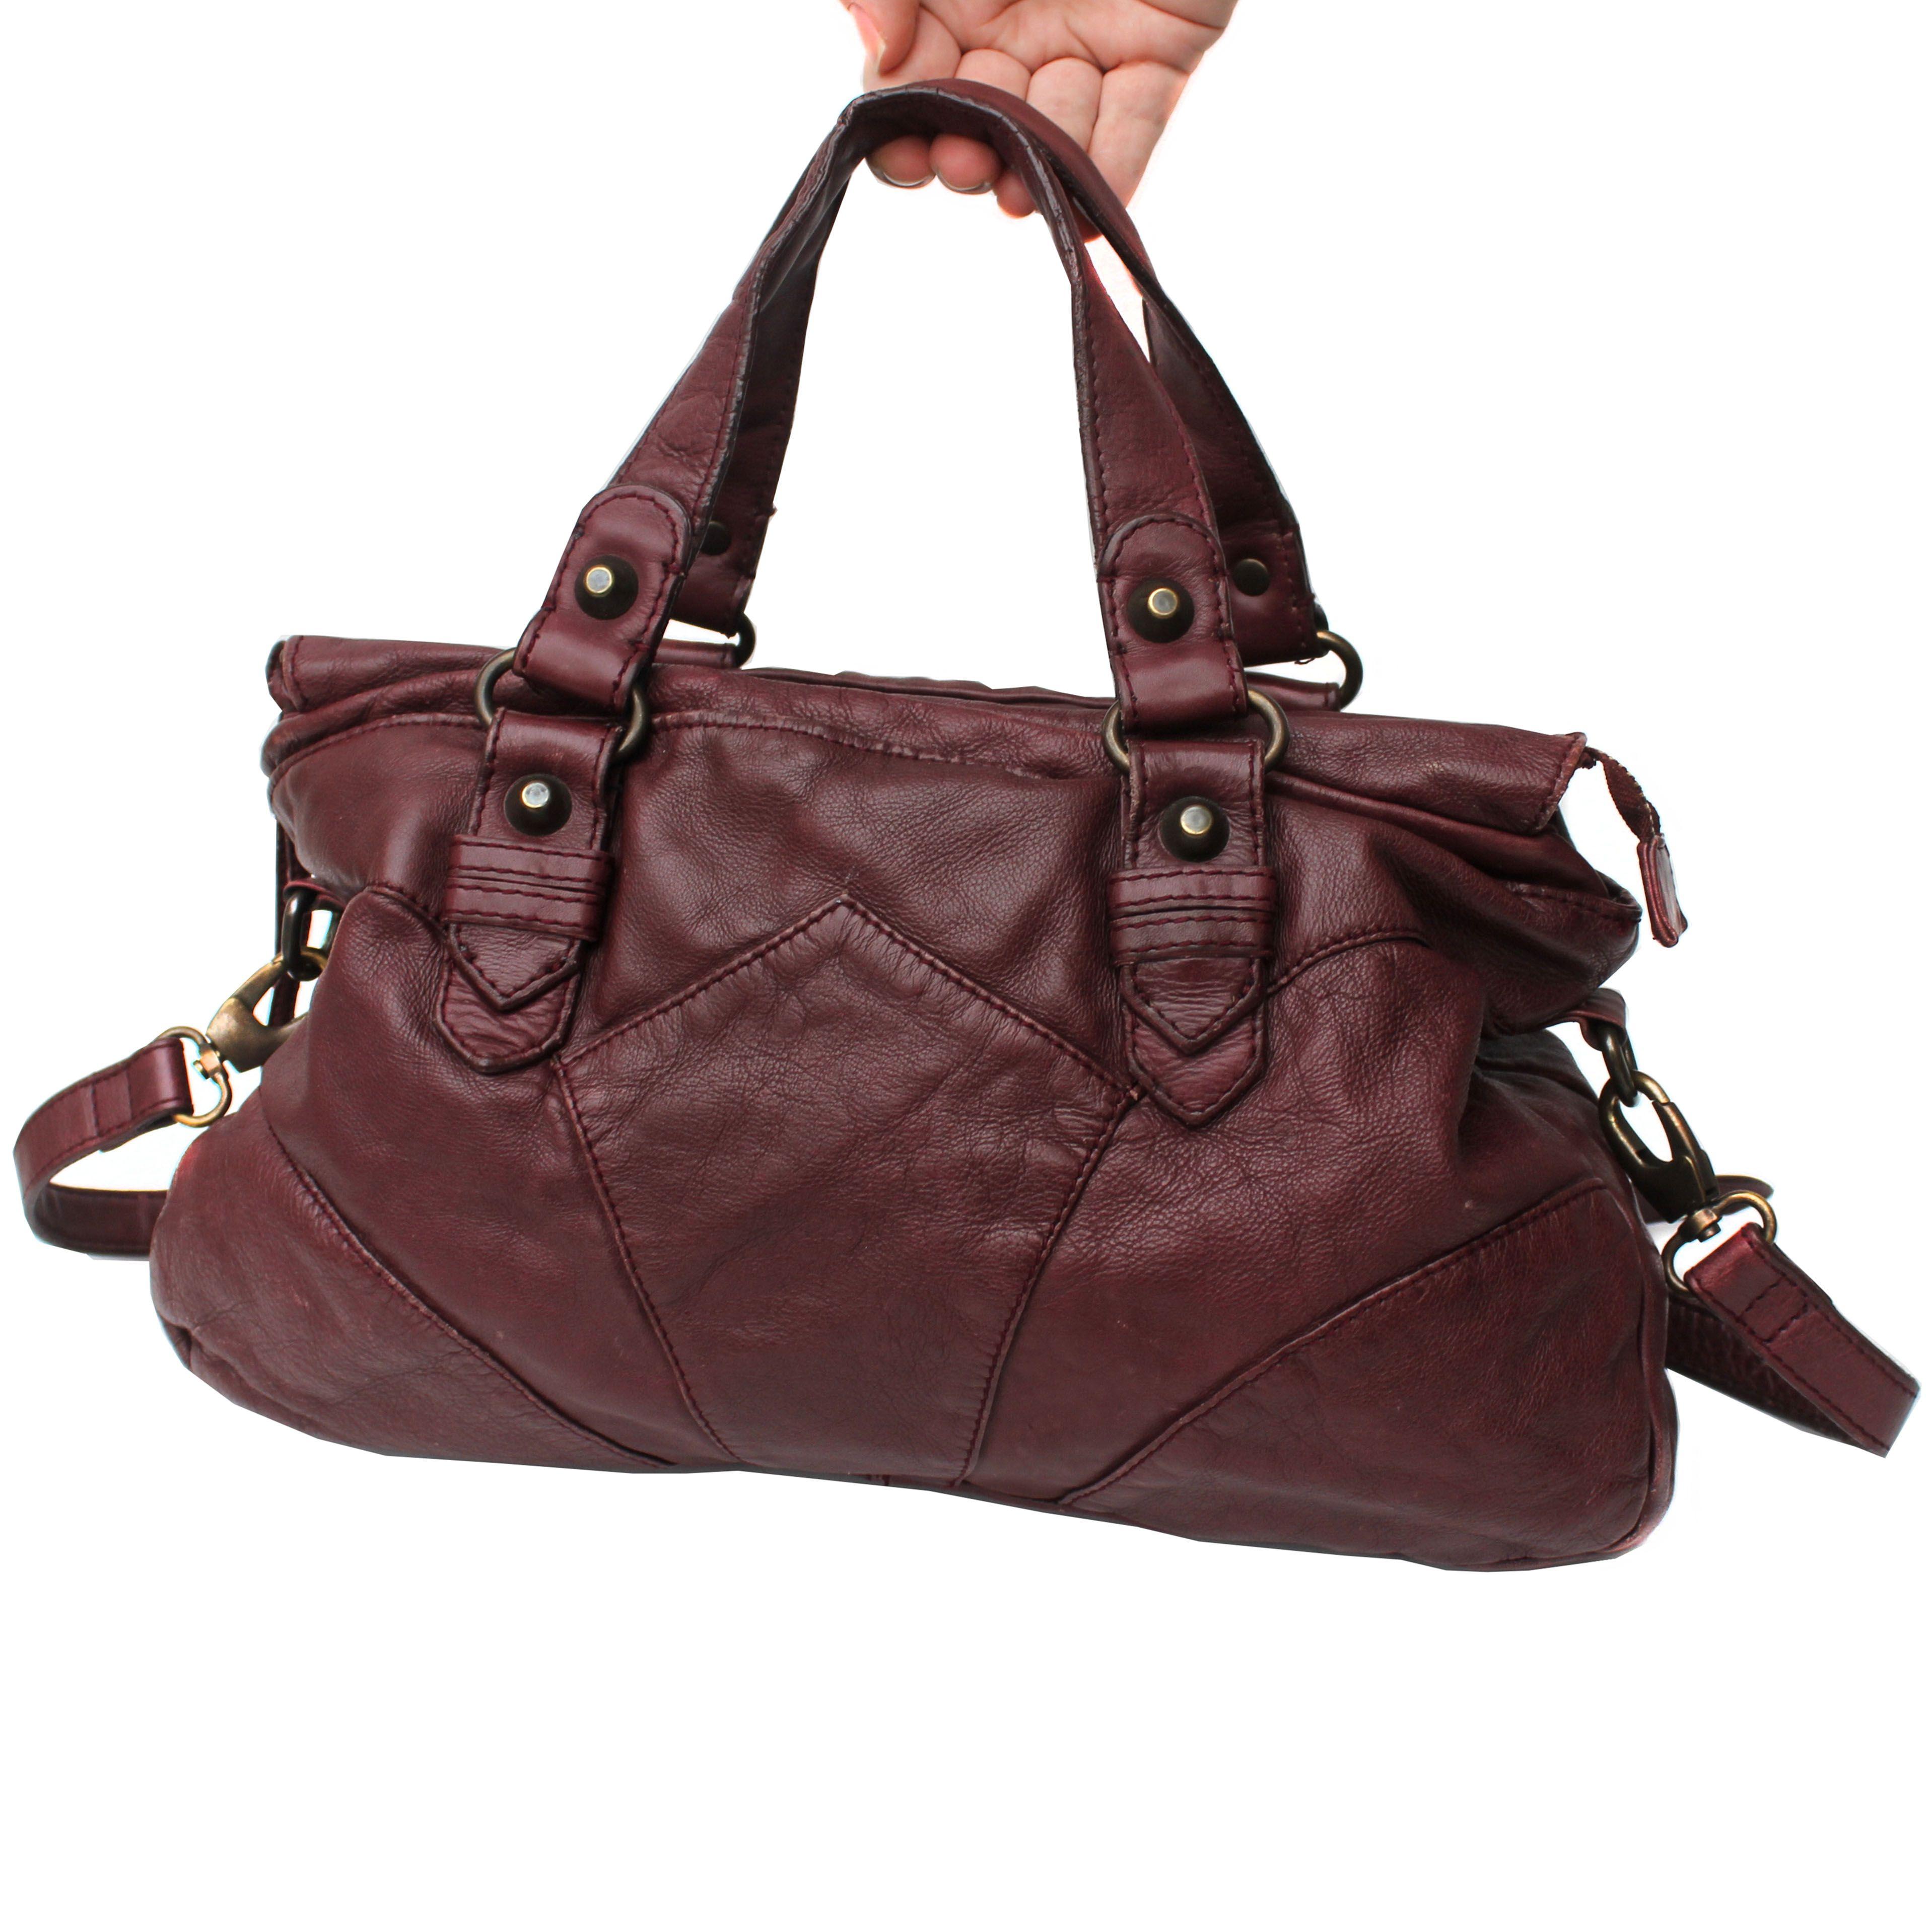 Pre-owned - Leather handbag Zadig & Voltaire CjrIPgAk5